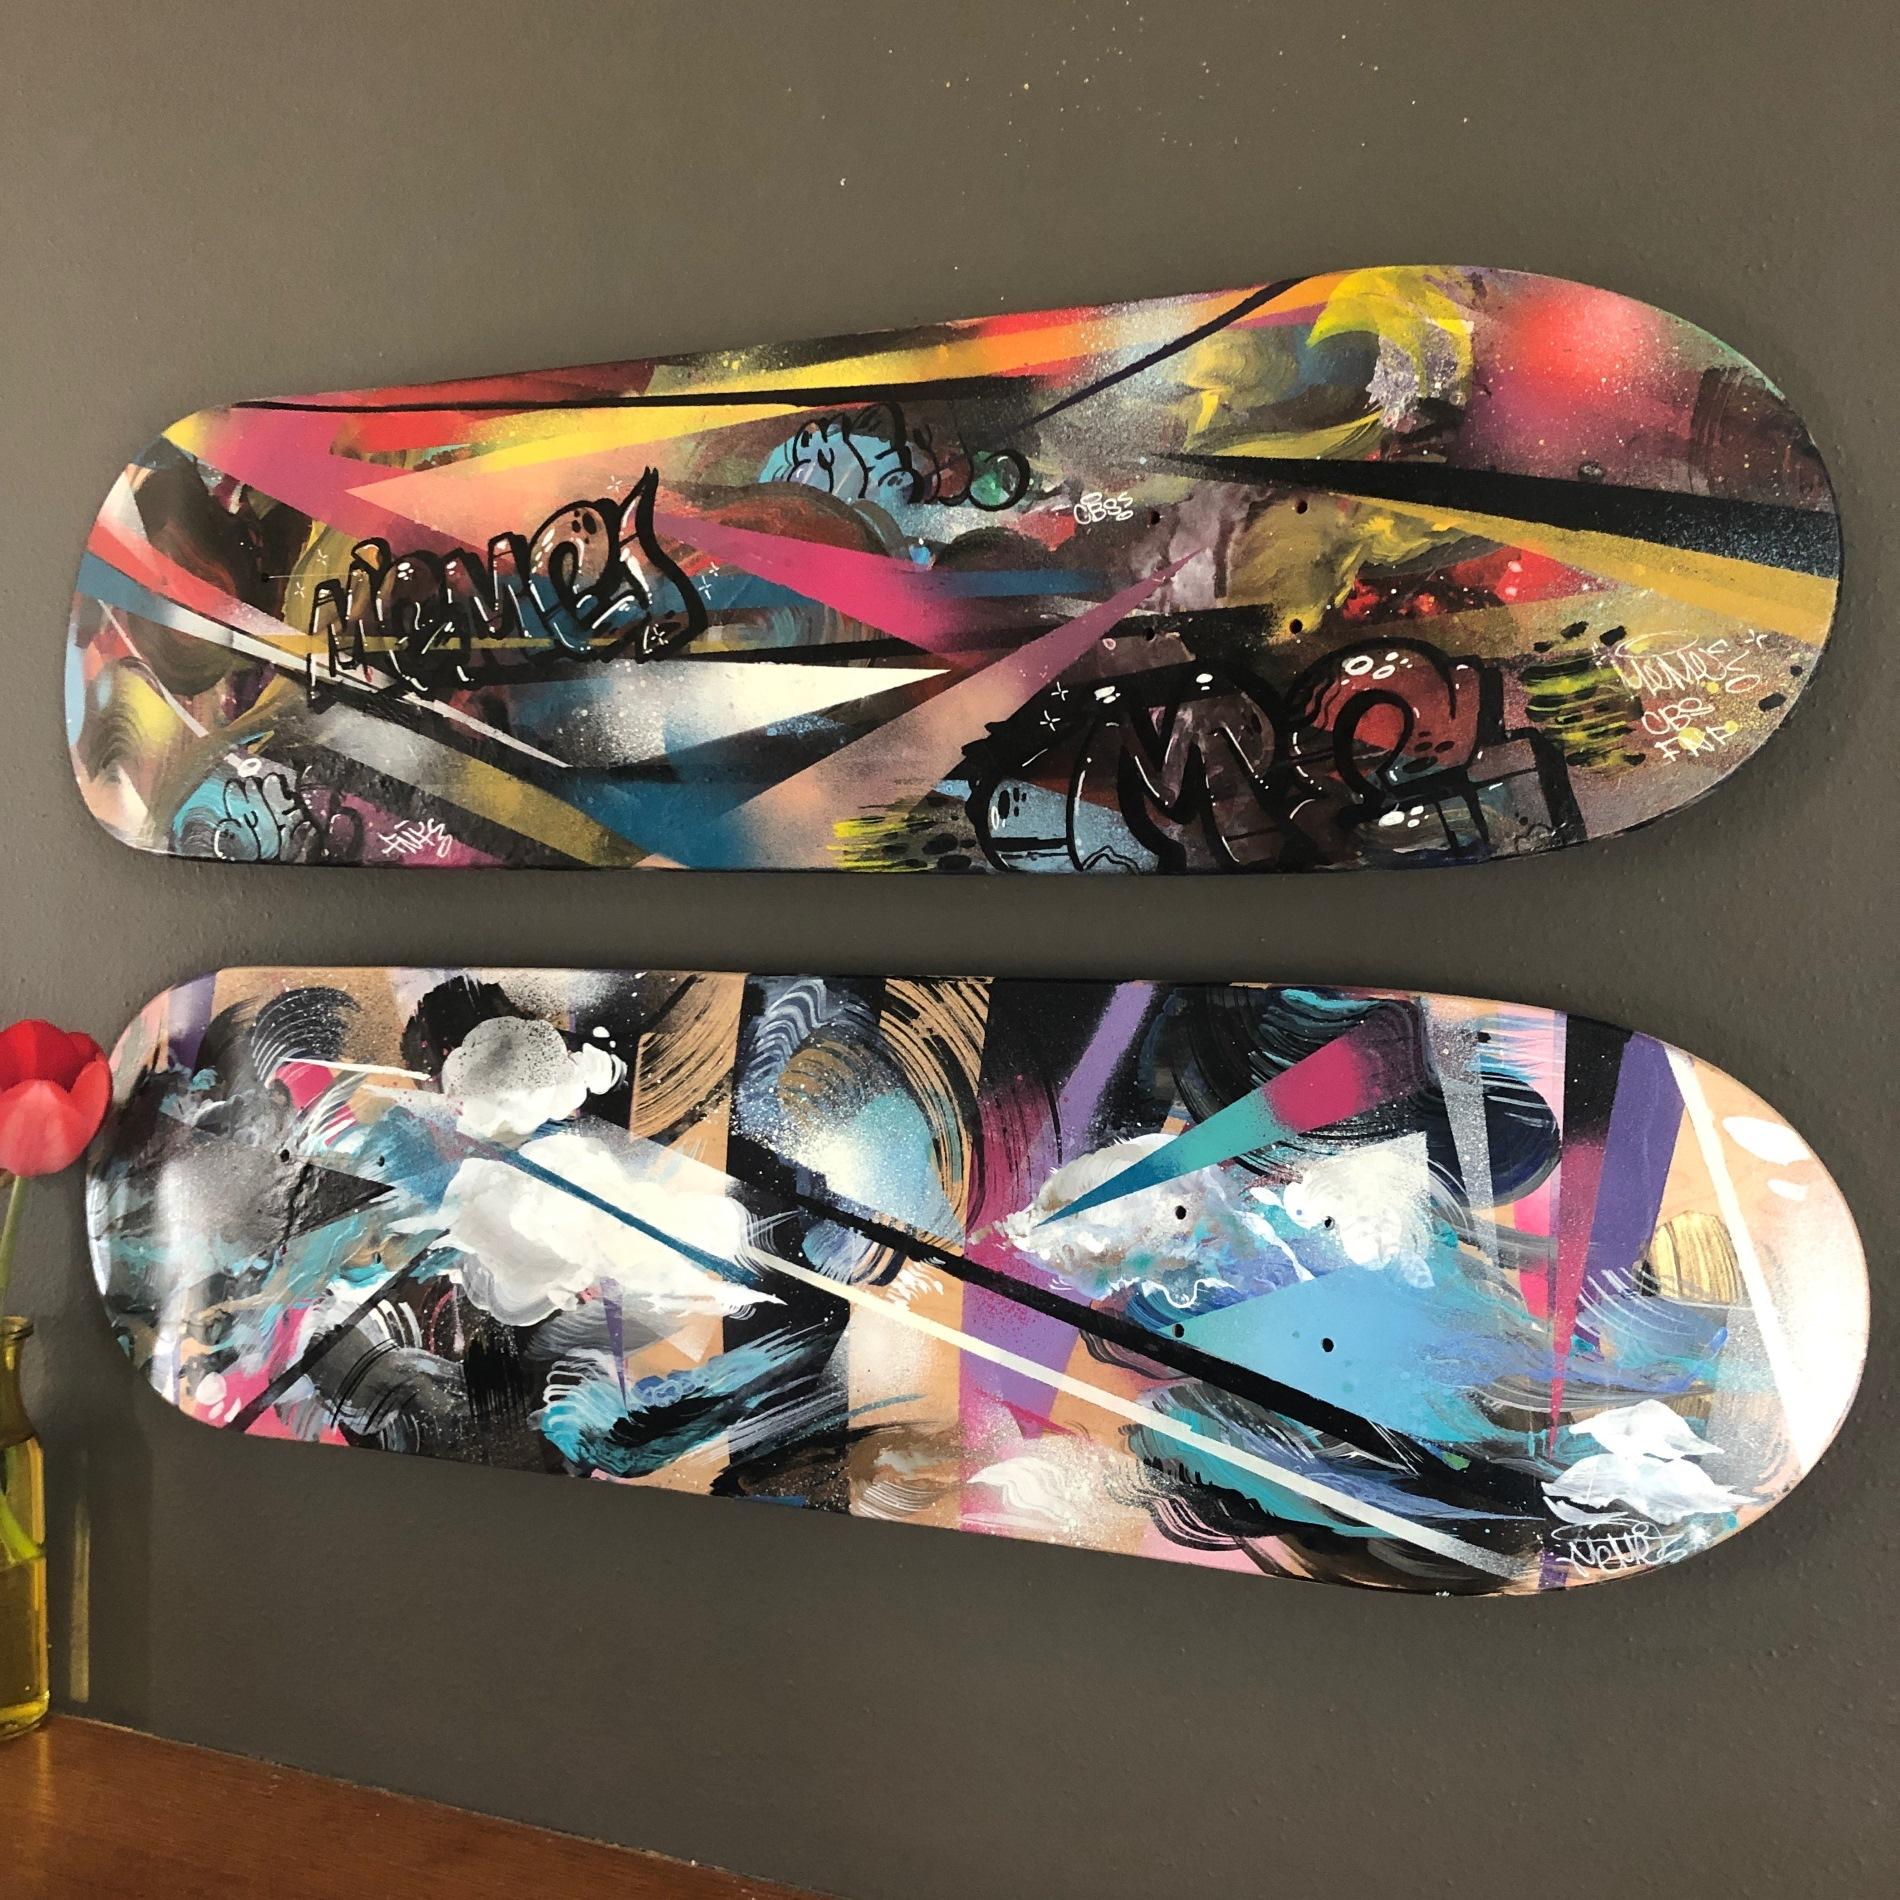 Meme Skatedeck Series